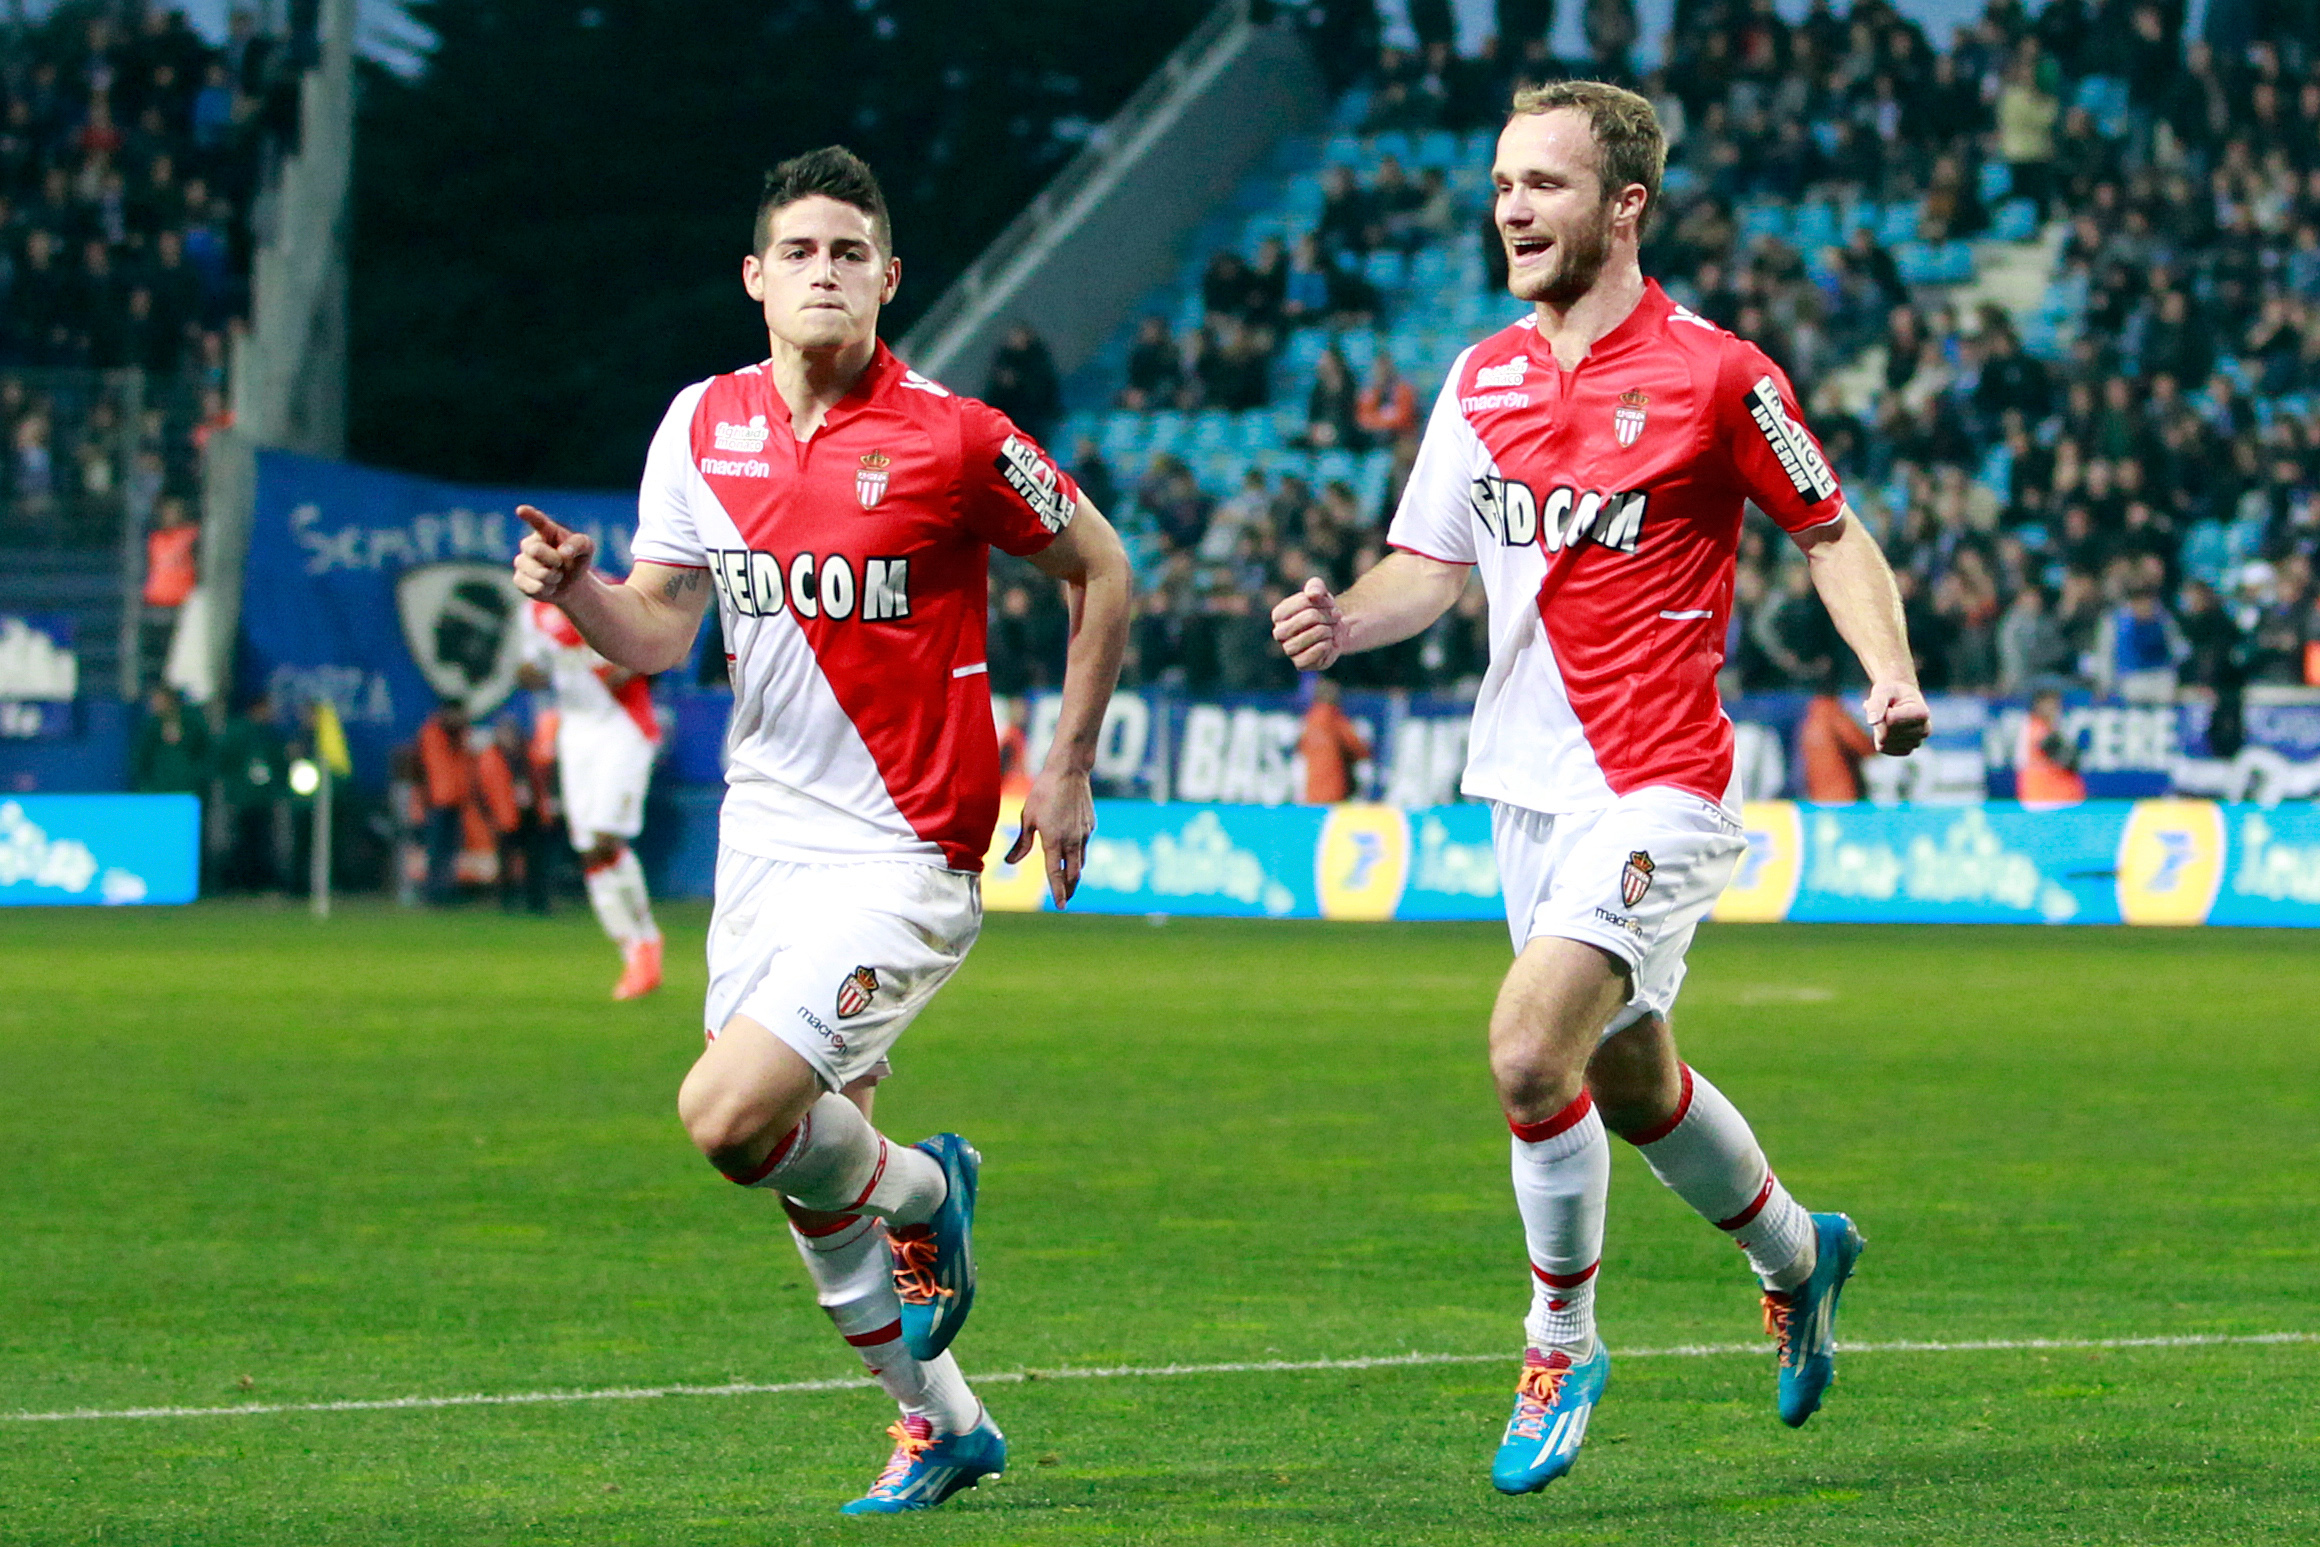 Monaco attacking midfielder James Rodriguez